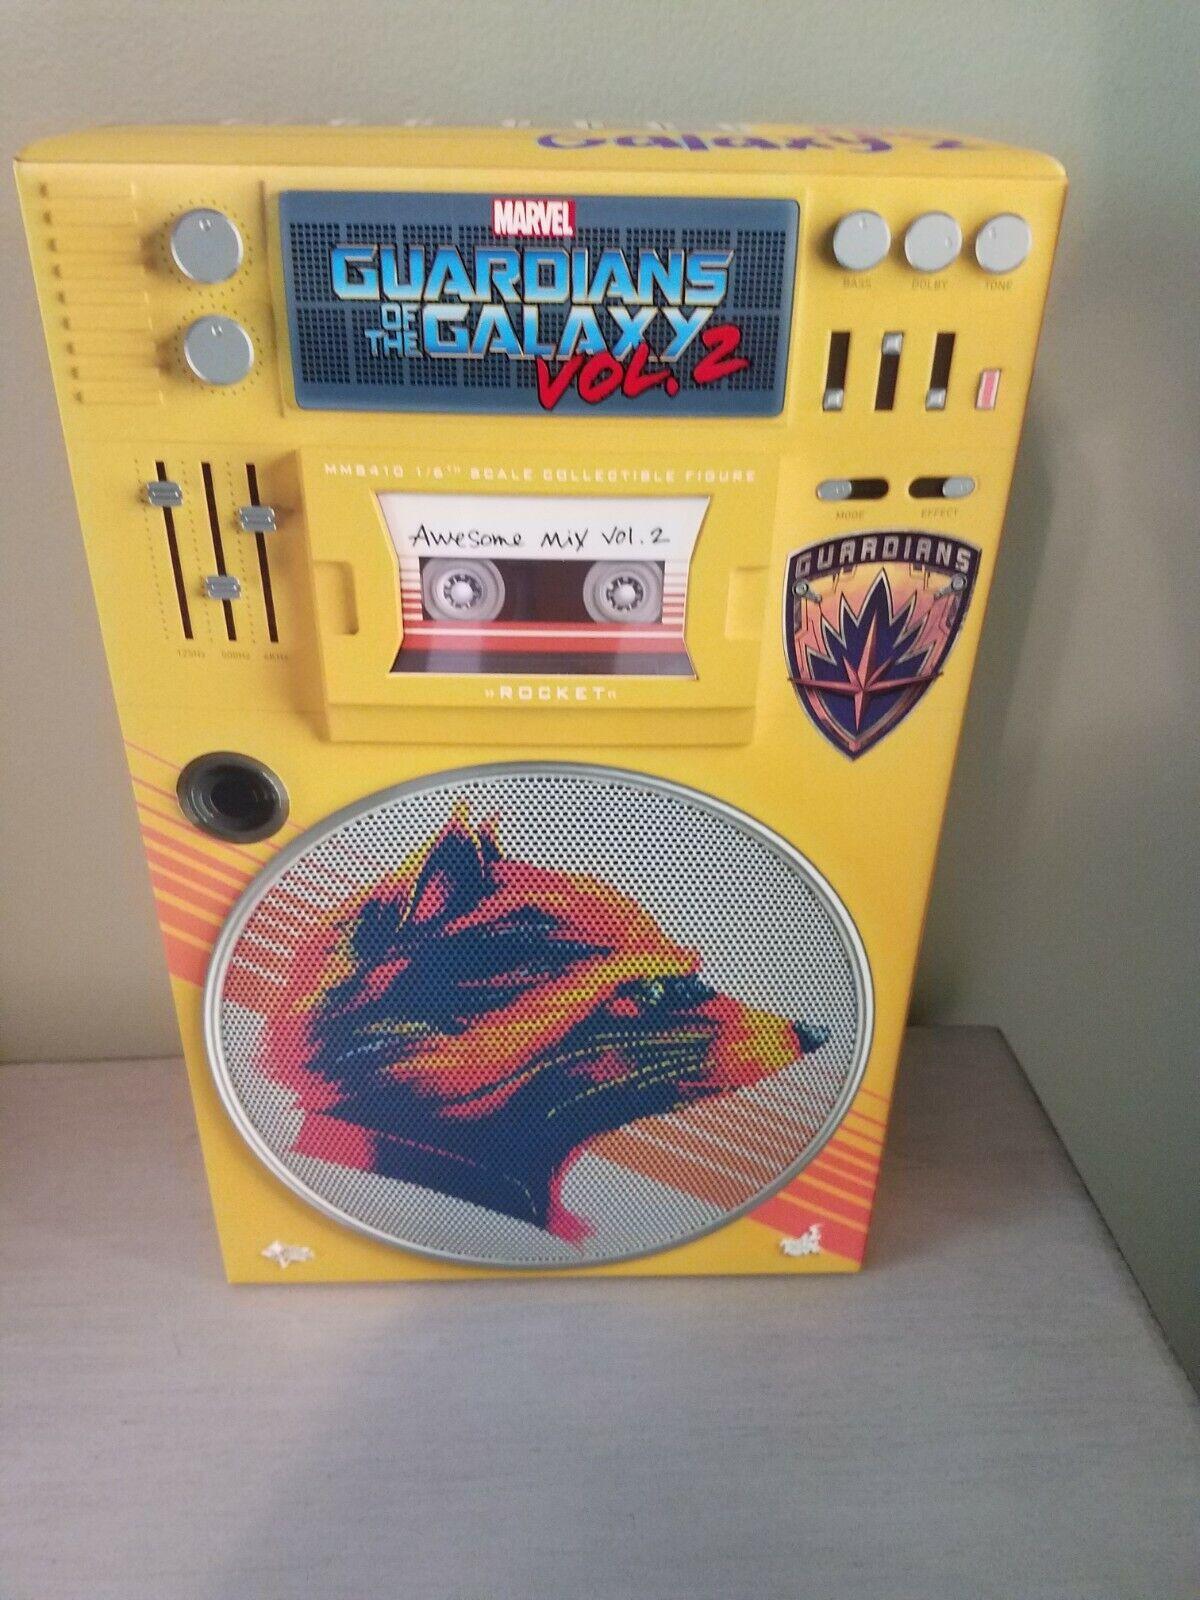 Hot Toys Rocket Guardians of the Galaxy Volume 2 Normal Please Read Description on eBay thumbnail